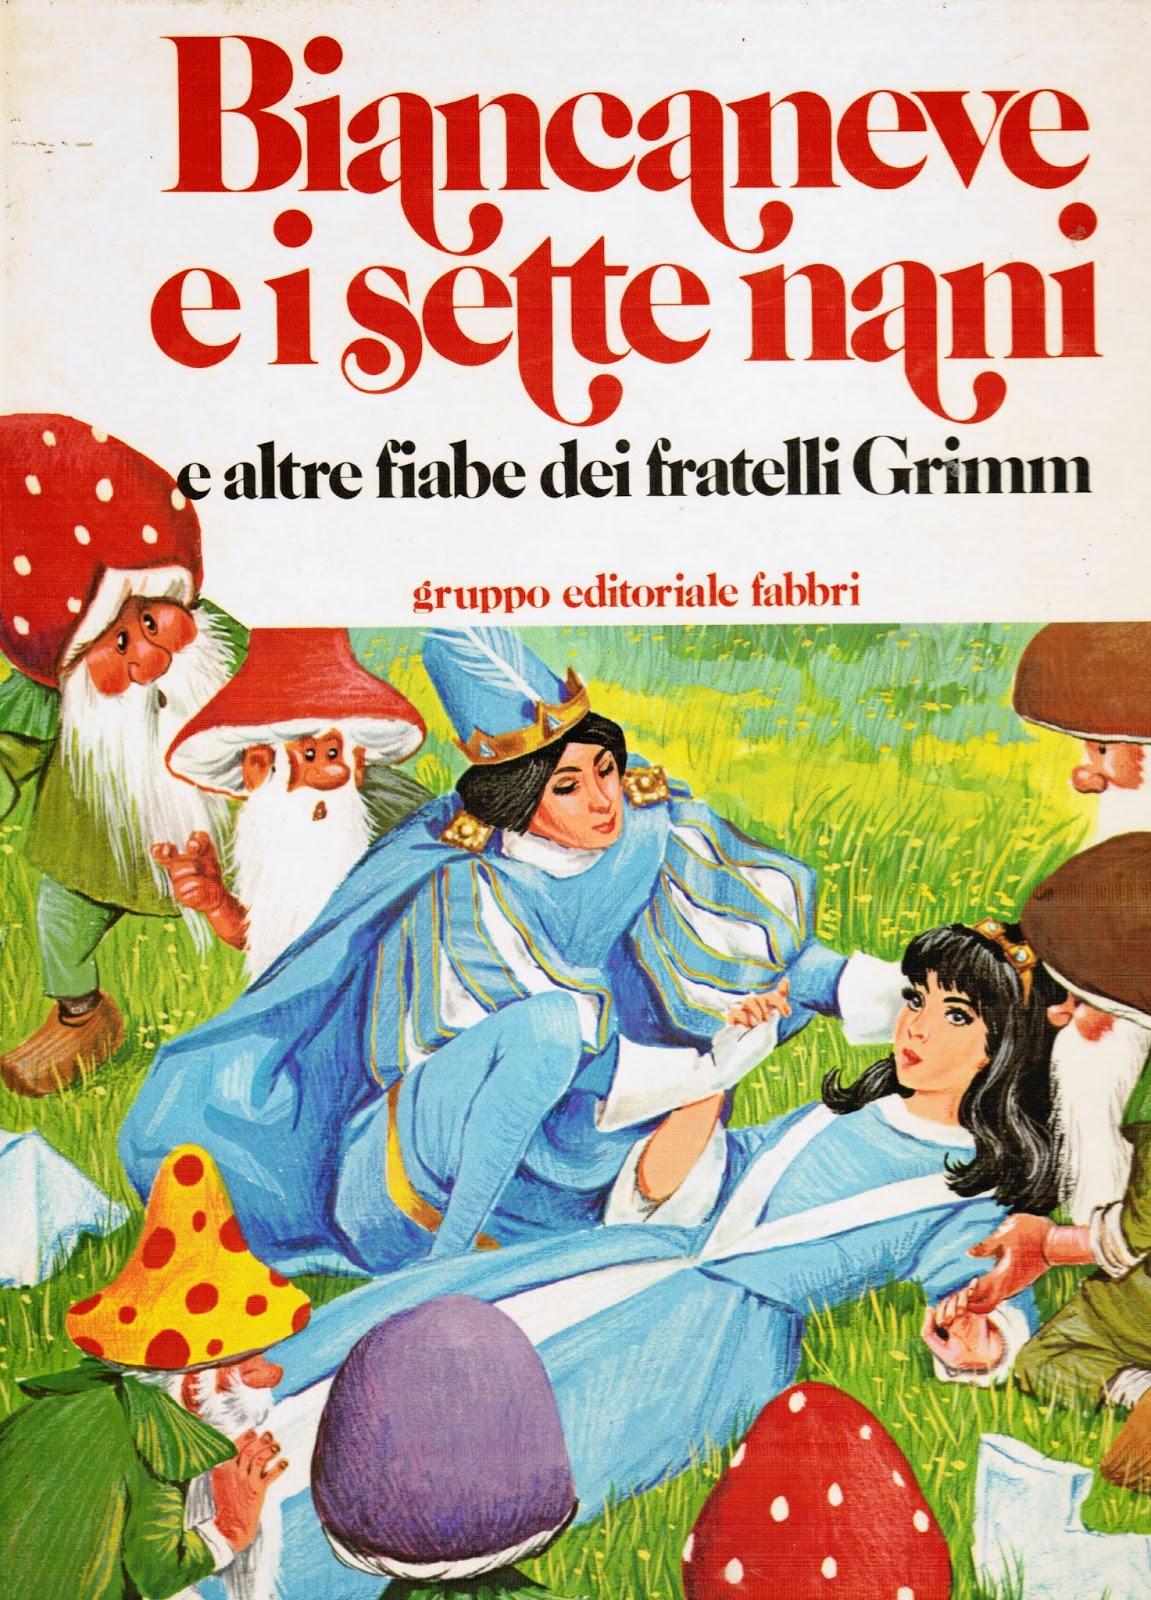 http://maisonderose.files.wordpress.com/2014/04/biancaneve-e-i-sette-nani-e-altre-fiabe-dei-fratelli-grimm-1983fabbri-editore.jpg